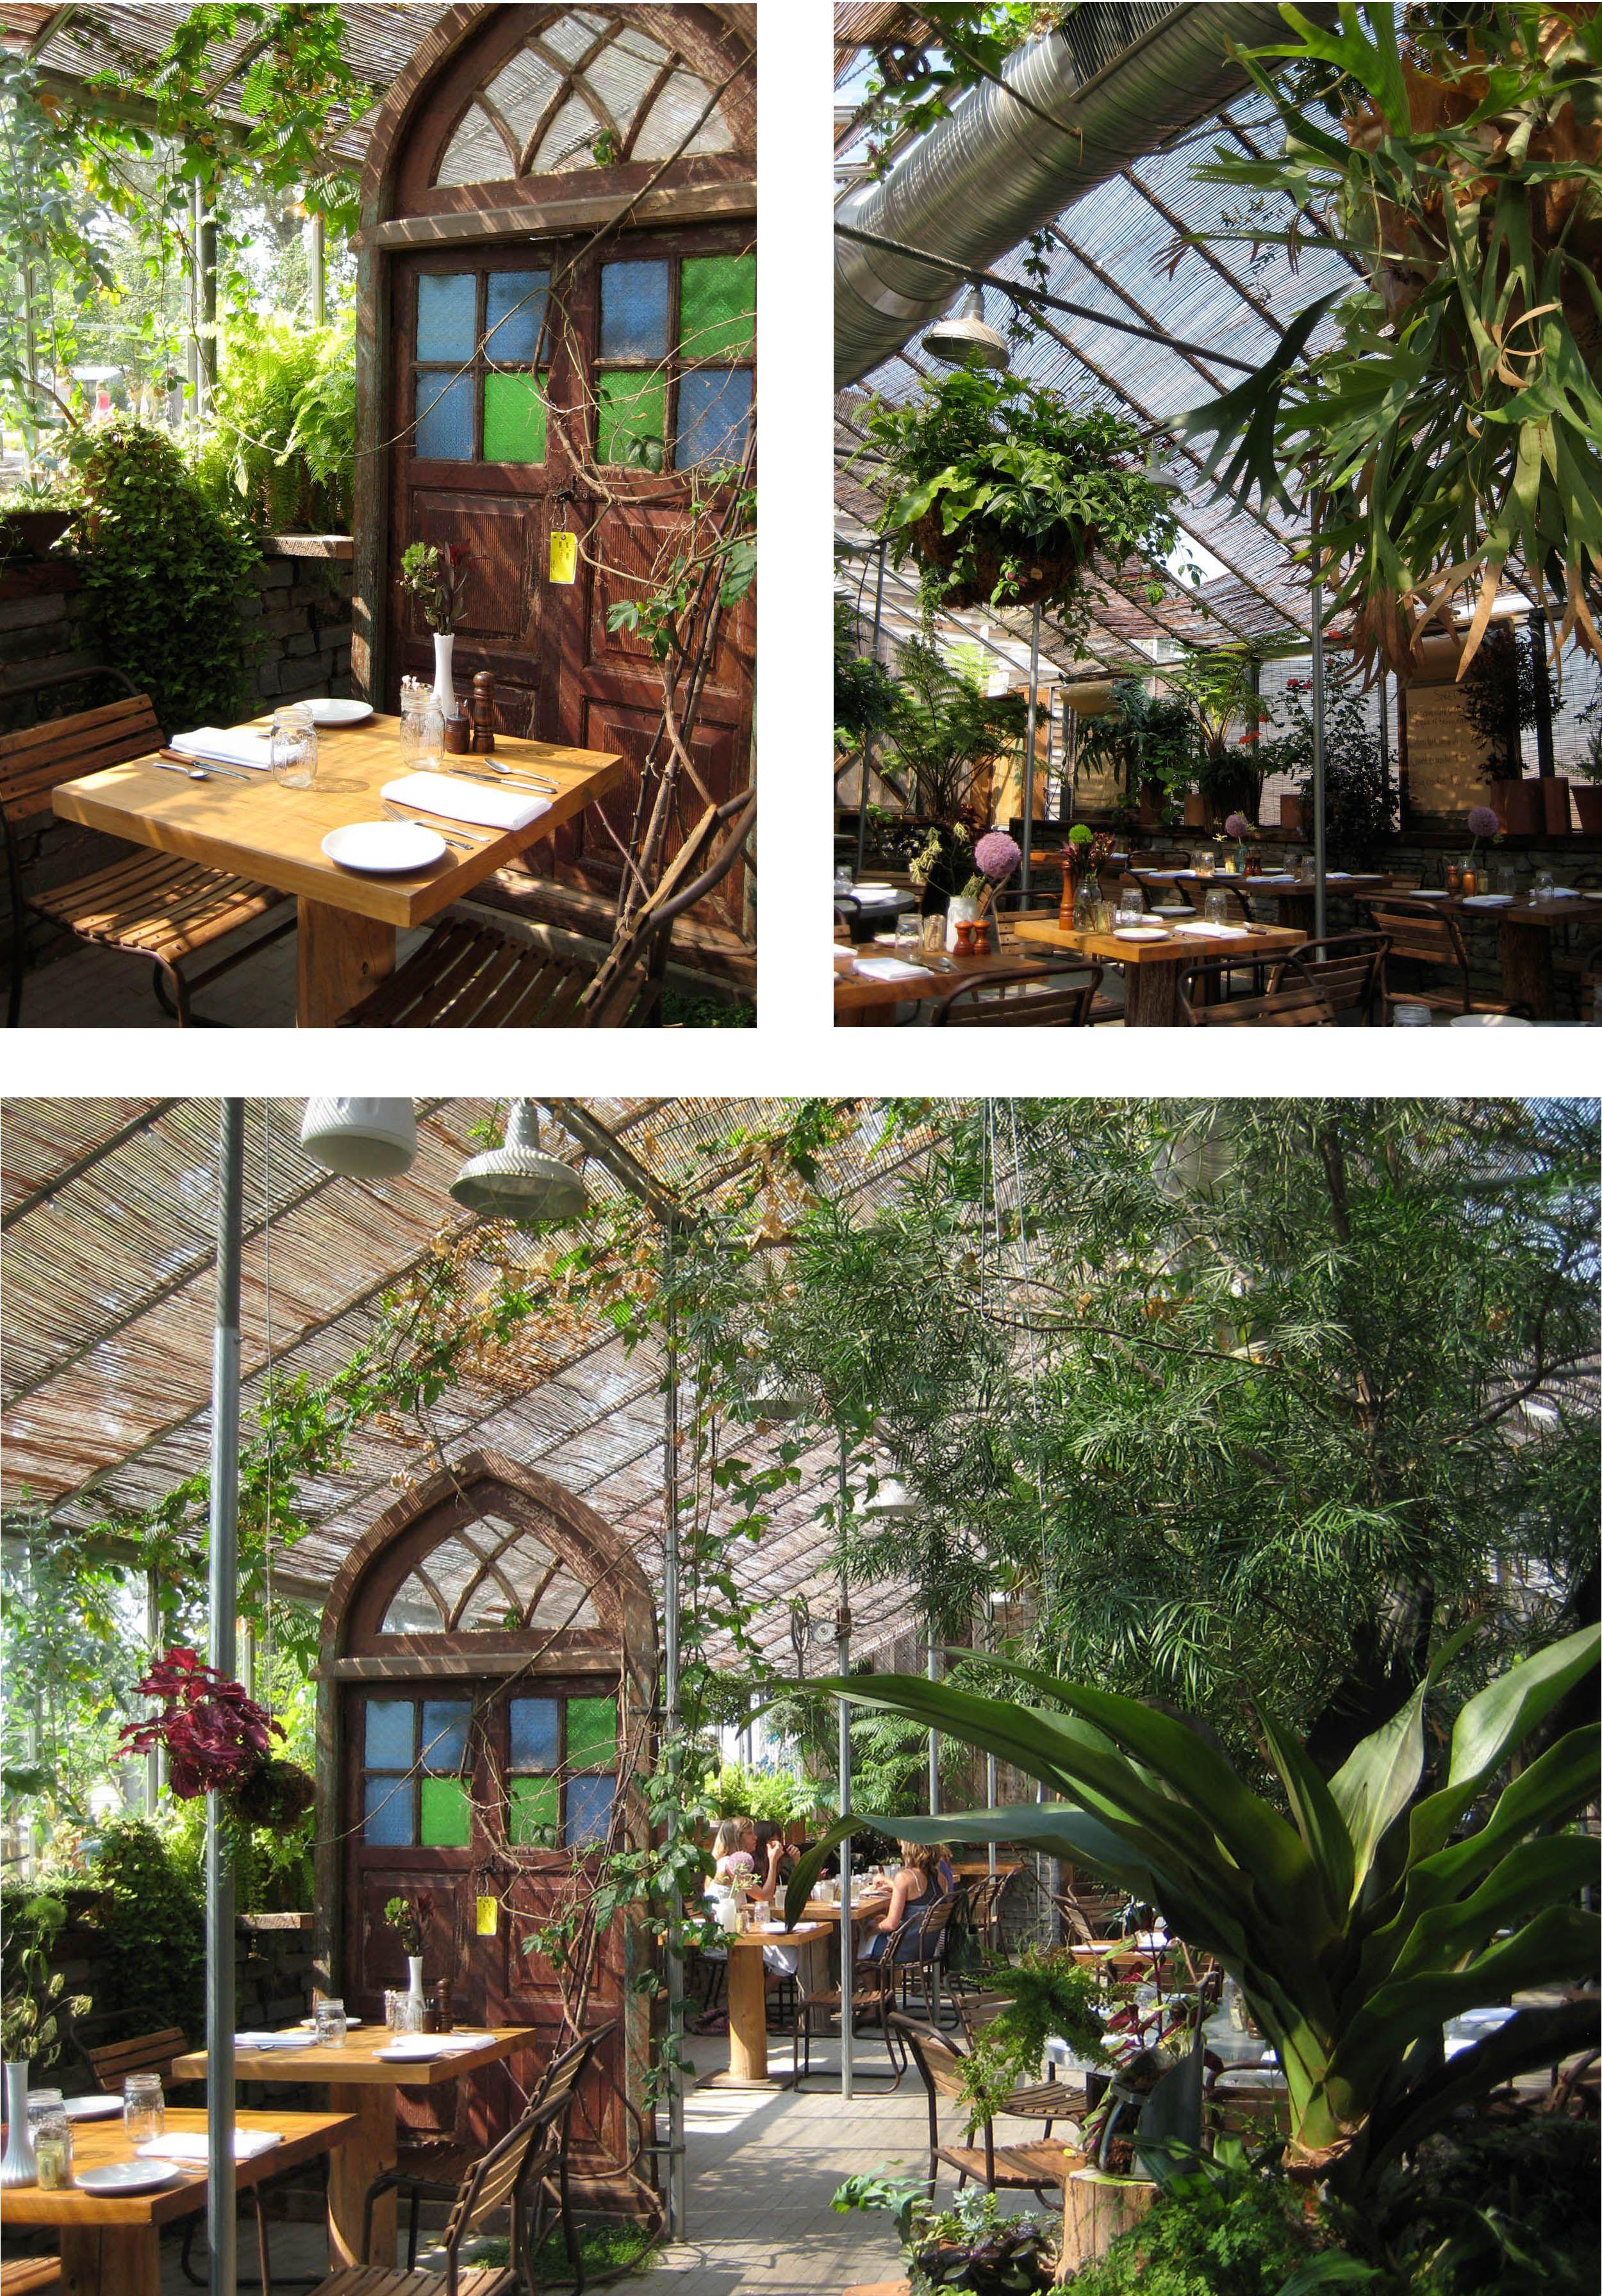 diseño kaper restaurant hospitality design inspiración el